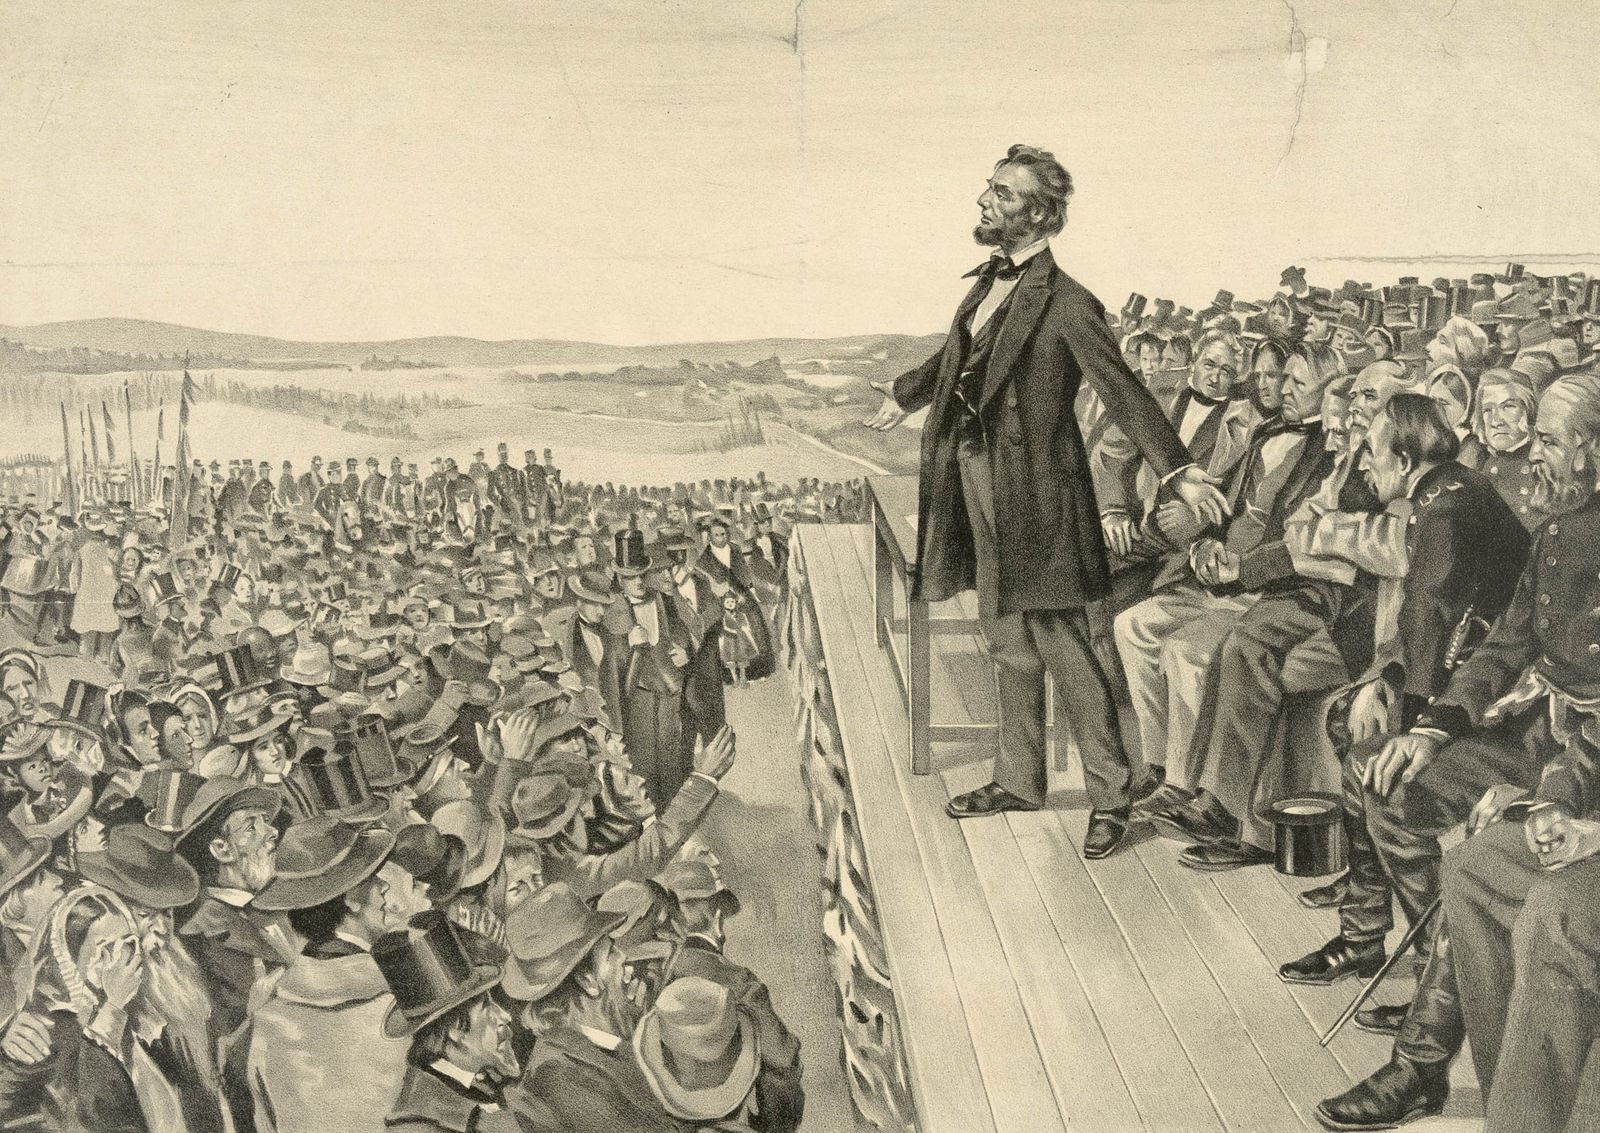 The Elusive Gettysburg Address